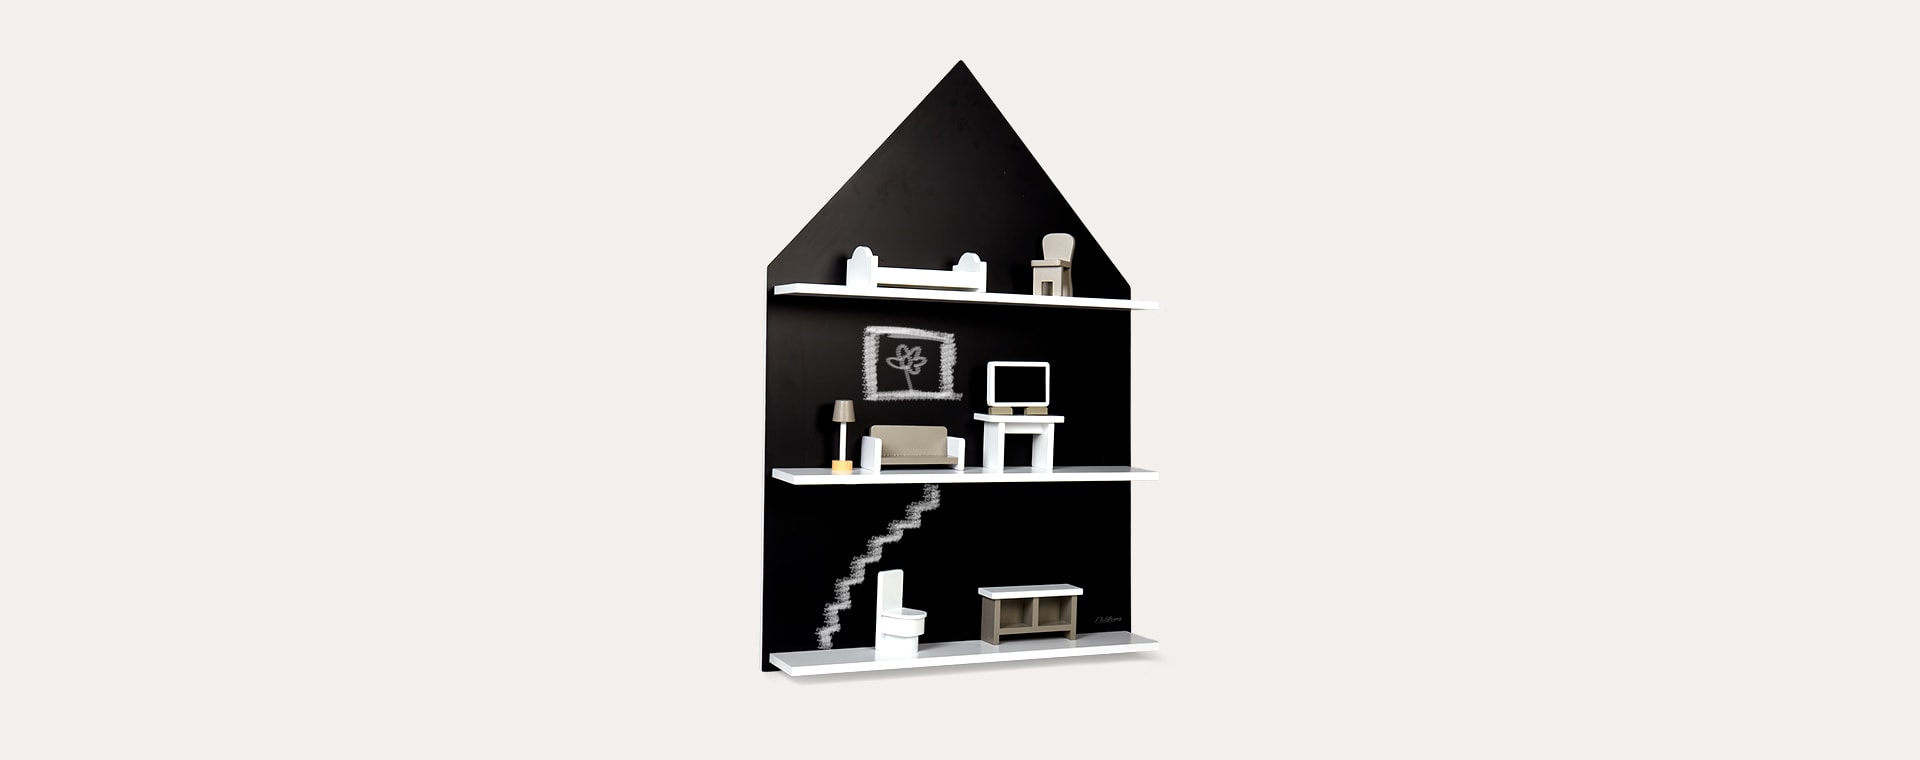 Black Childhome Chalkboard House And Shelf